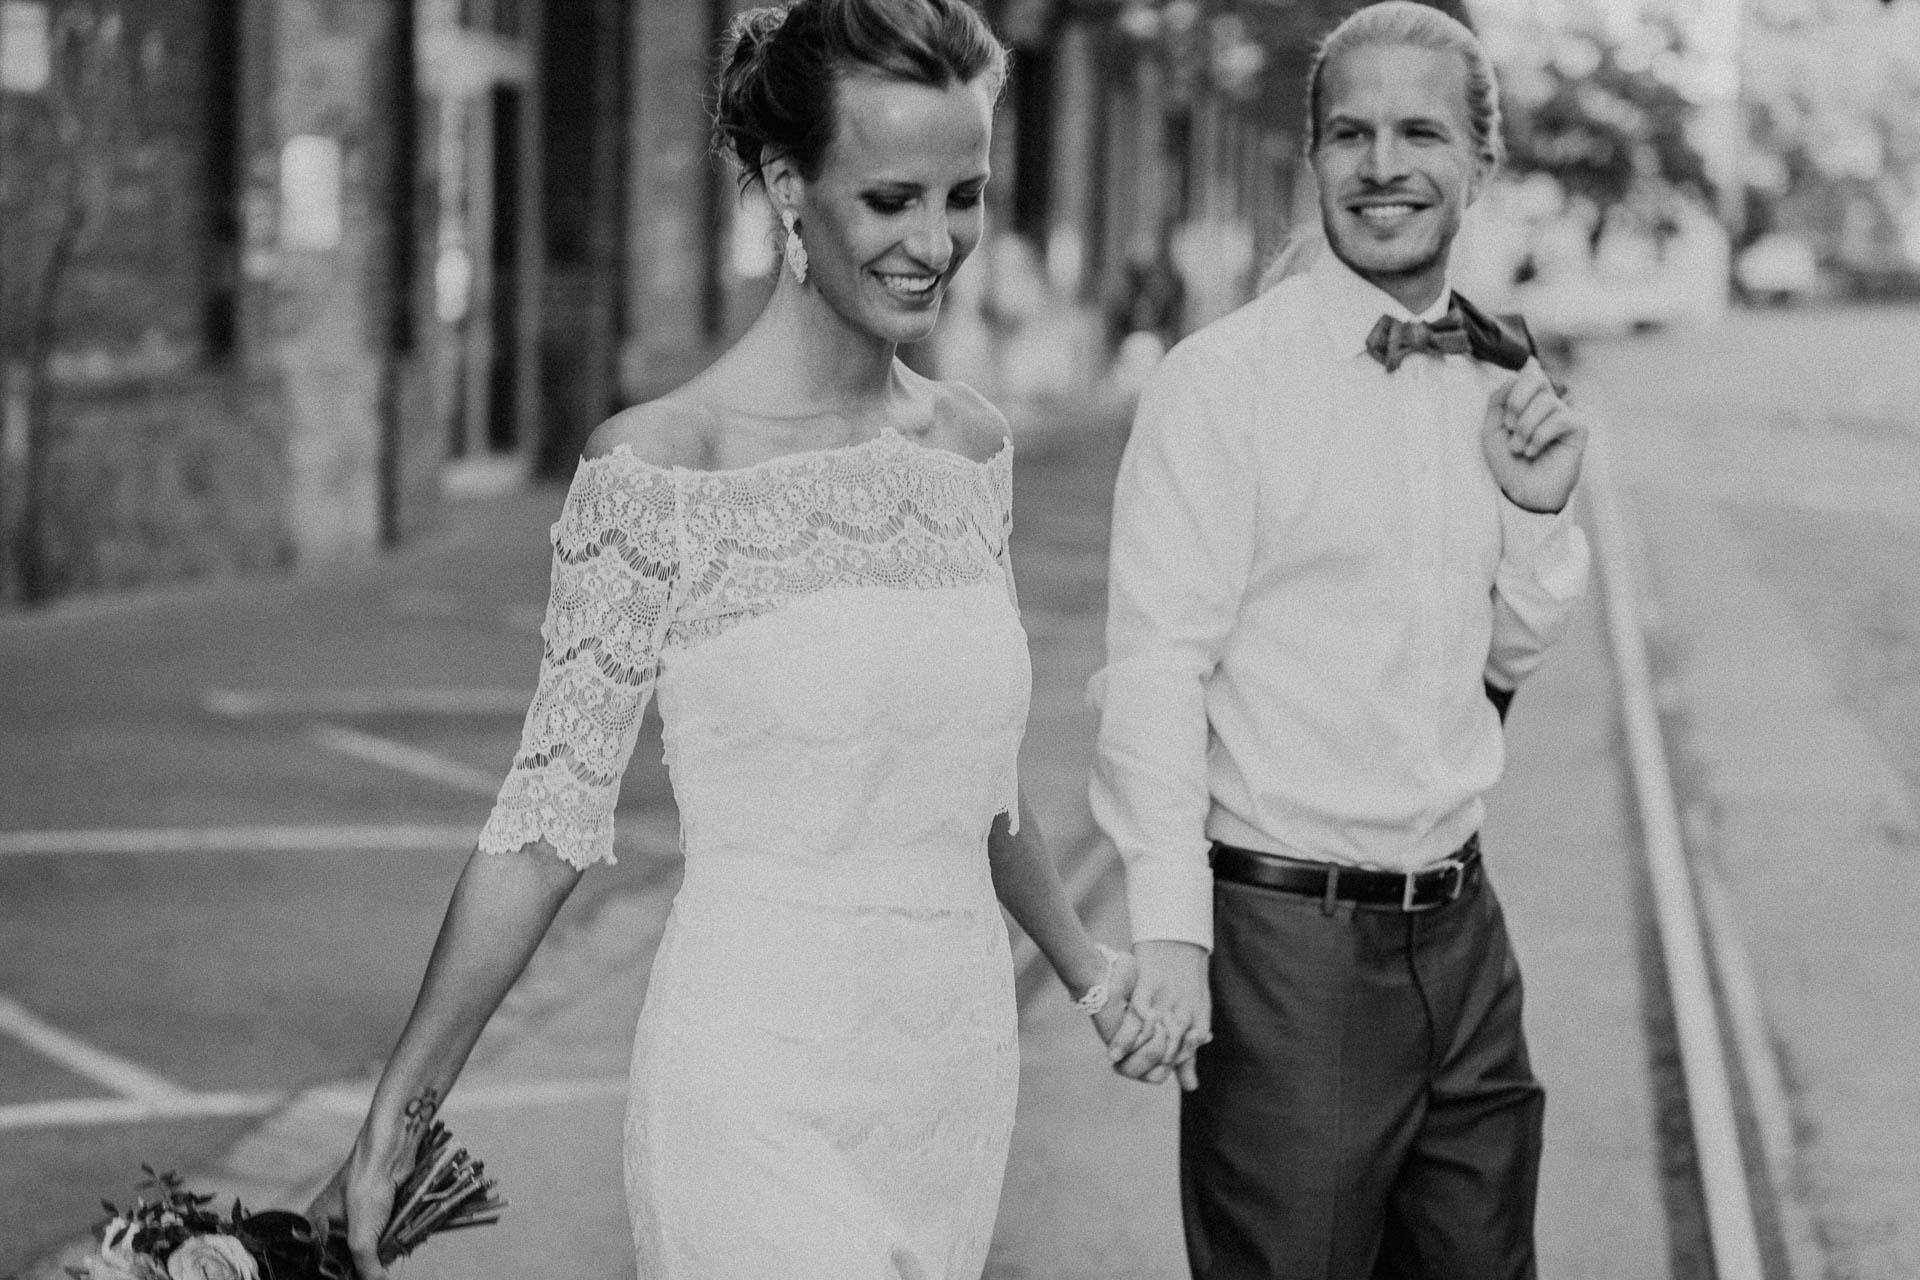 Brautpaar Hand in Hand, er himmelt sie an